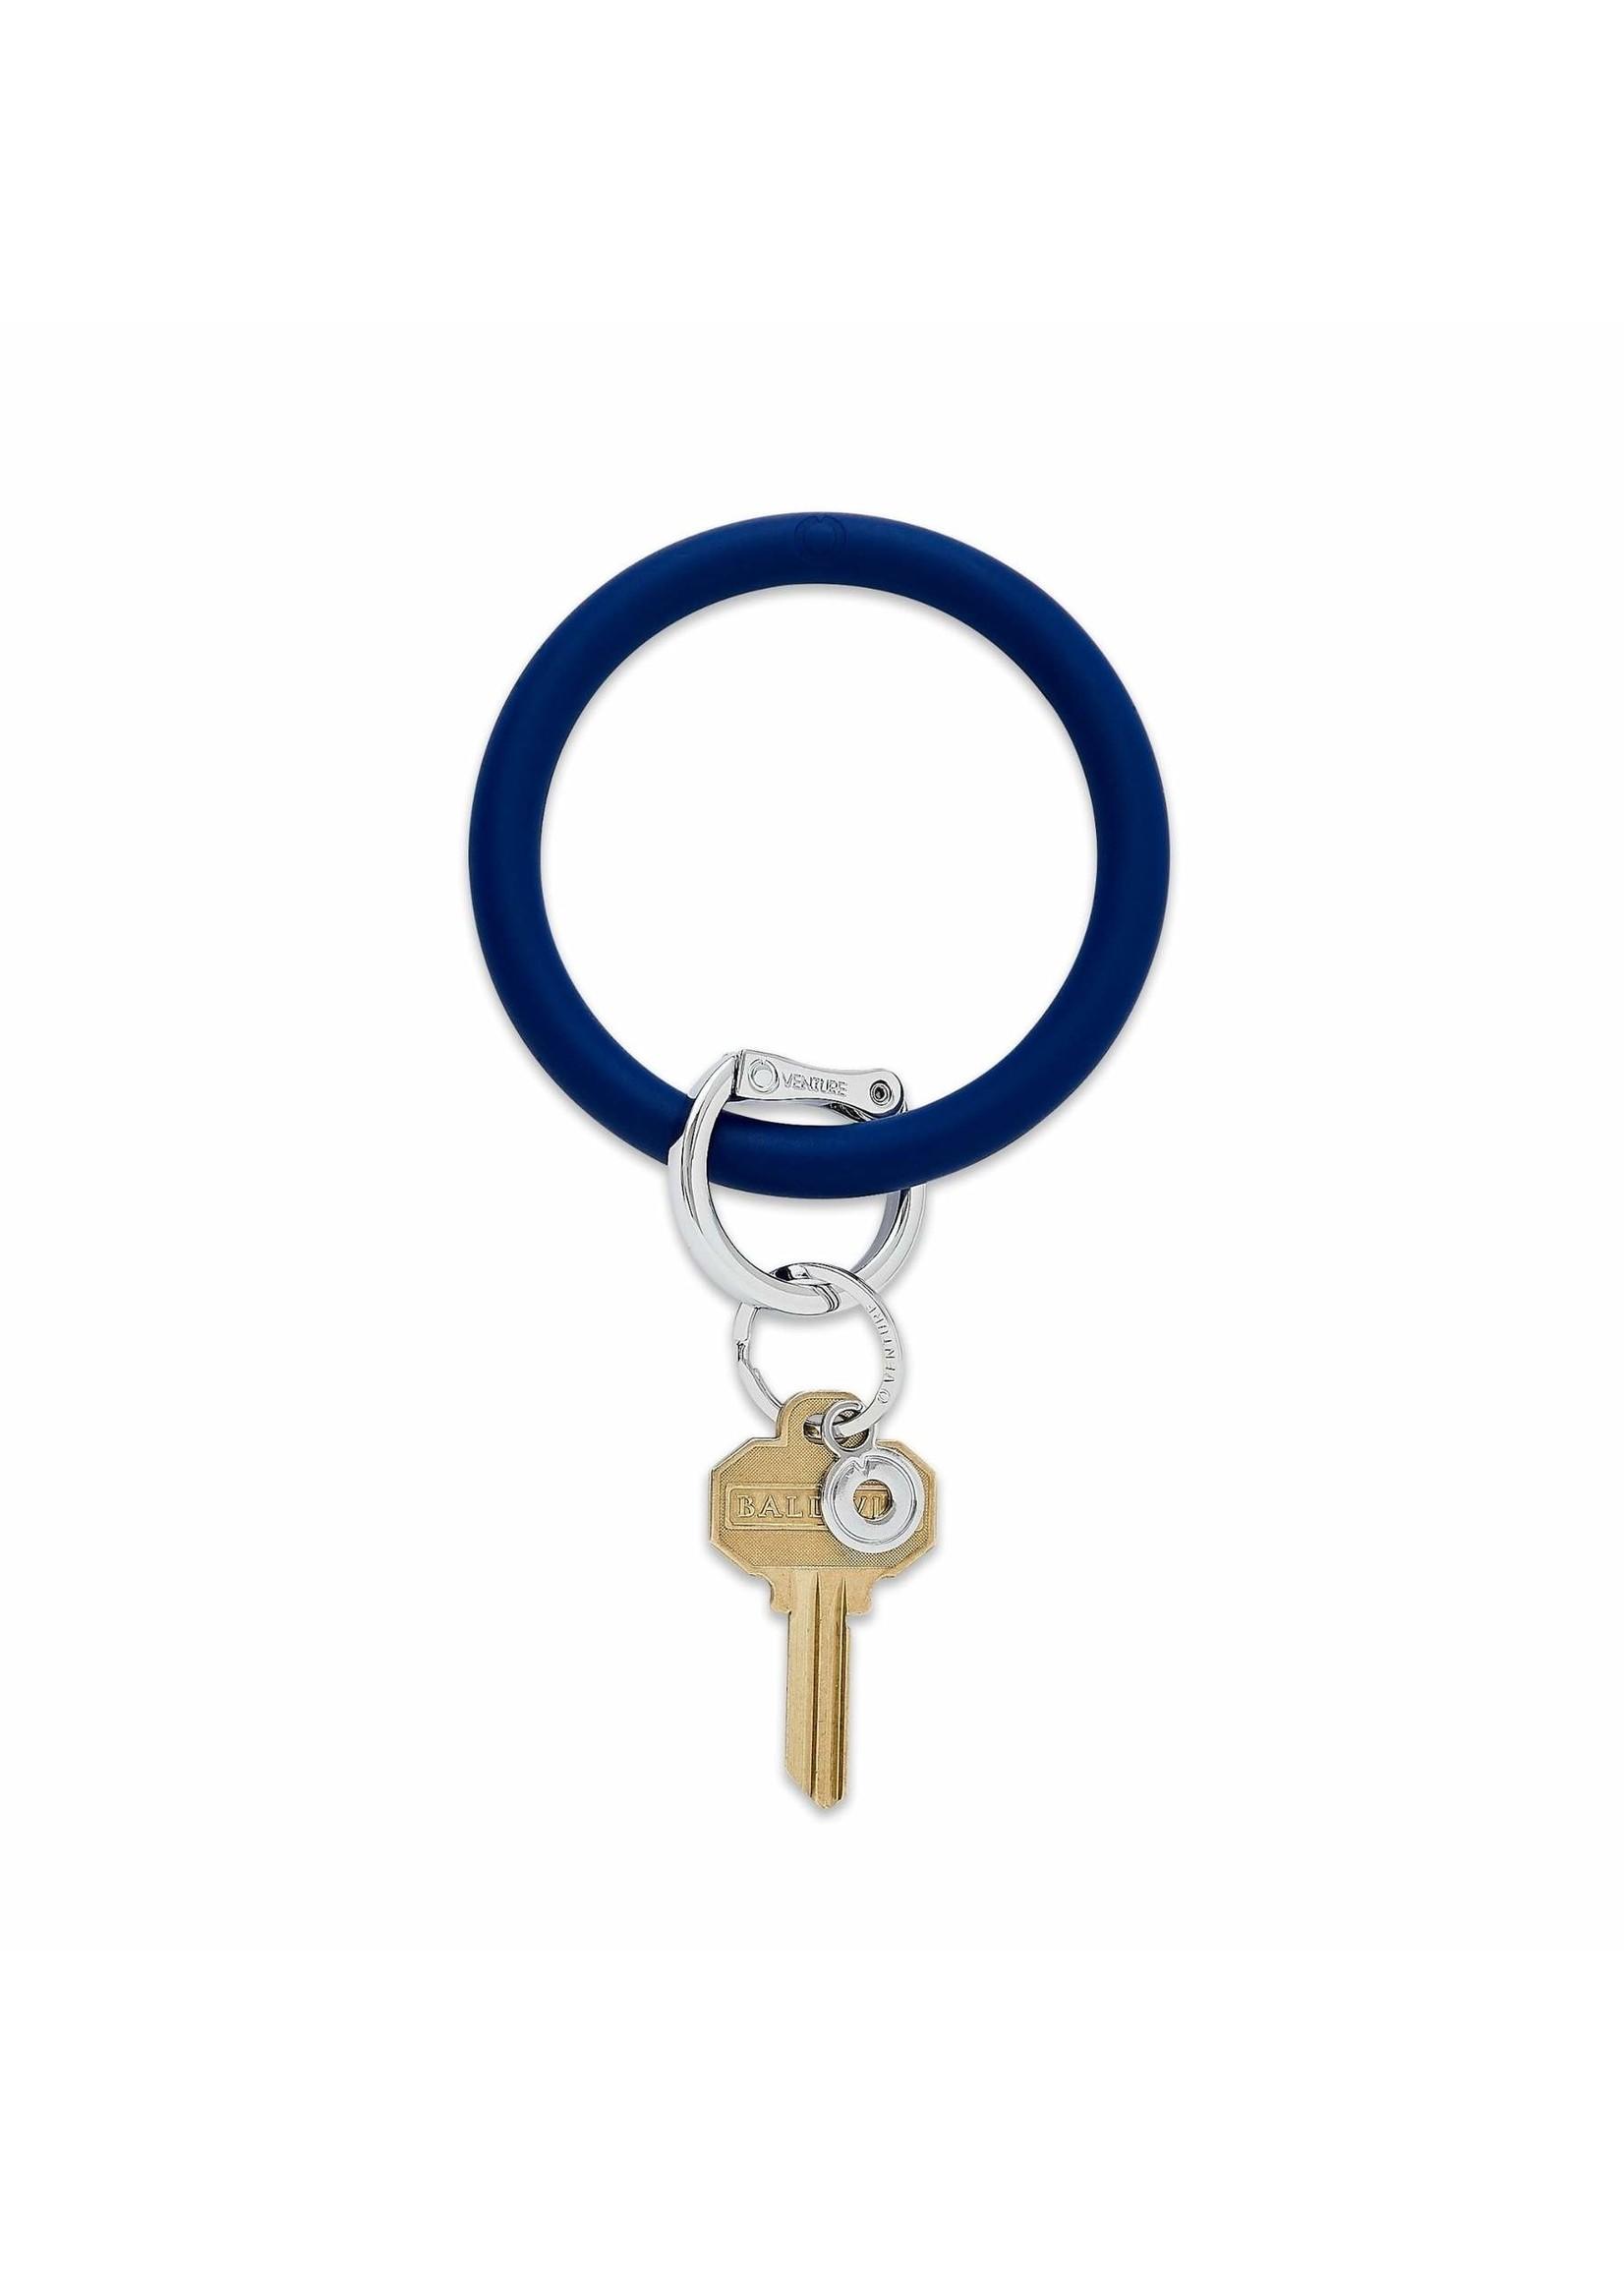 O-venture Silicone Key Ring - Navy